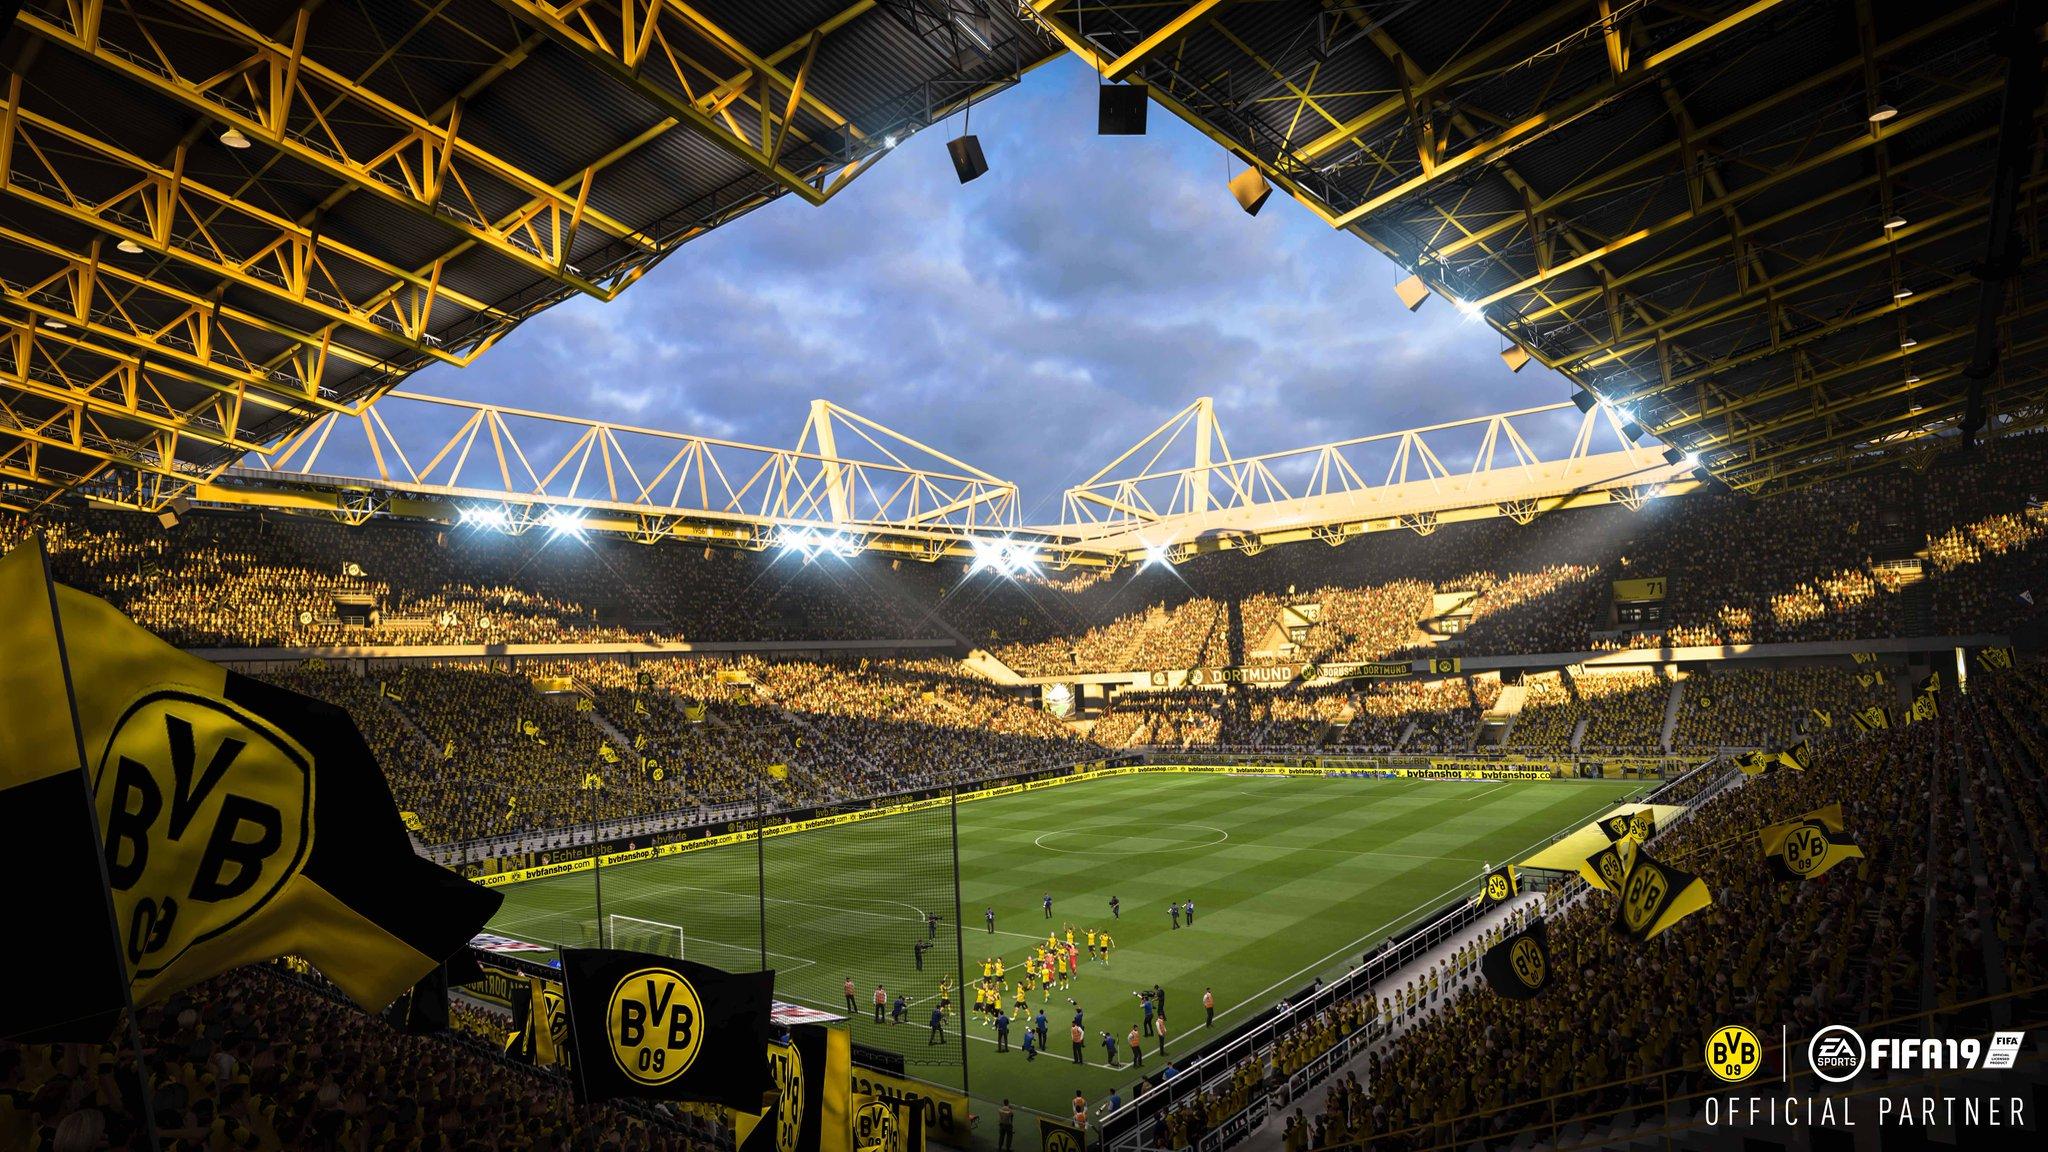 SVD-Borussia Dortmund